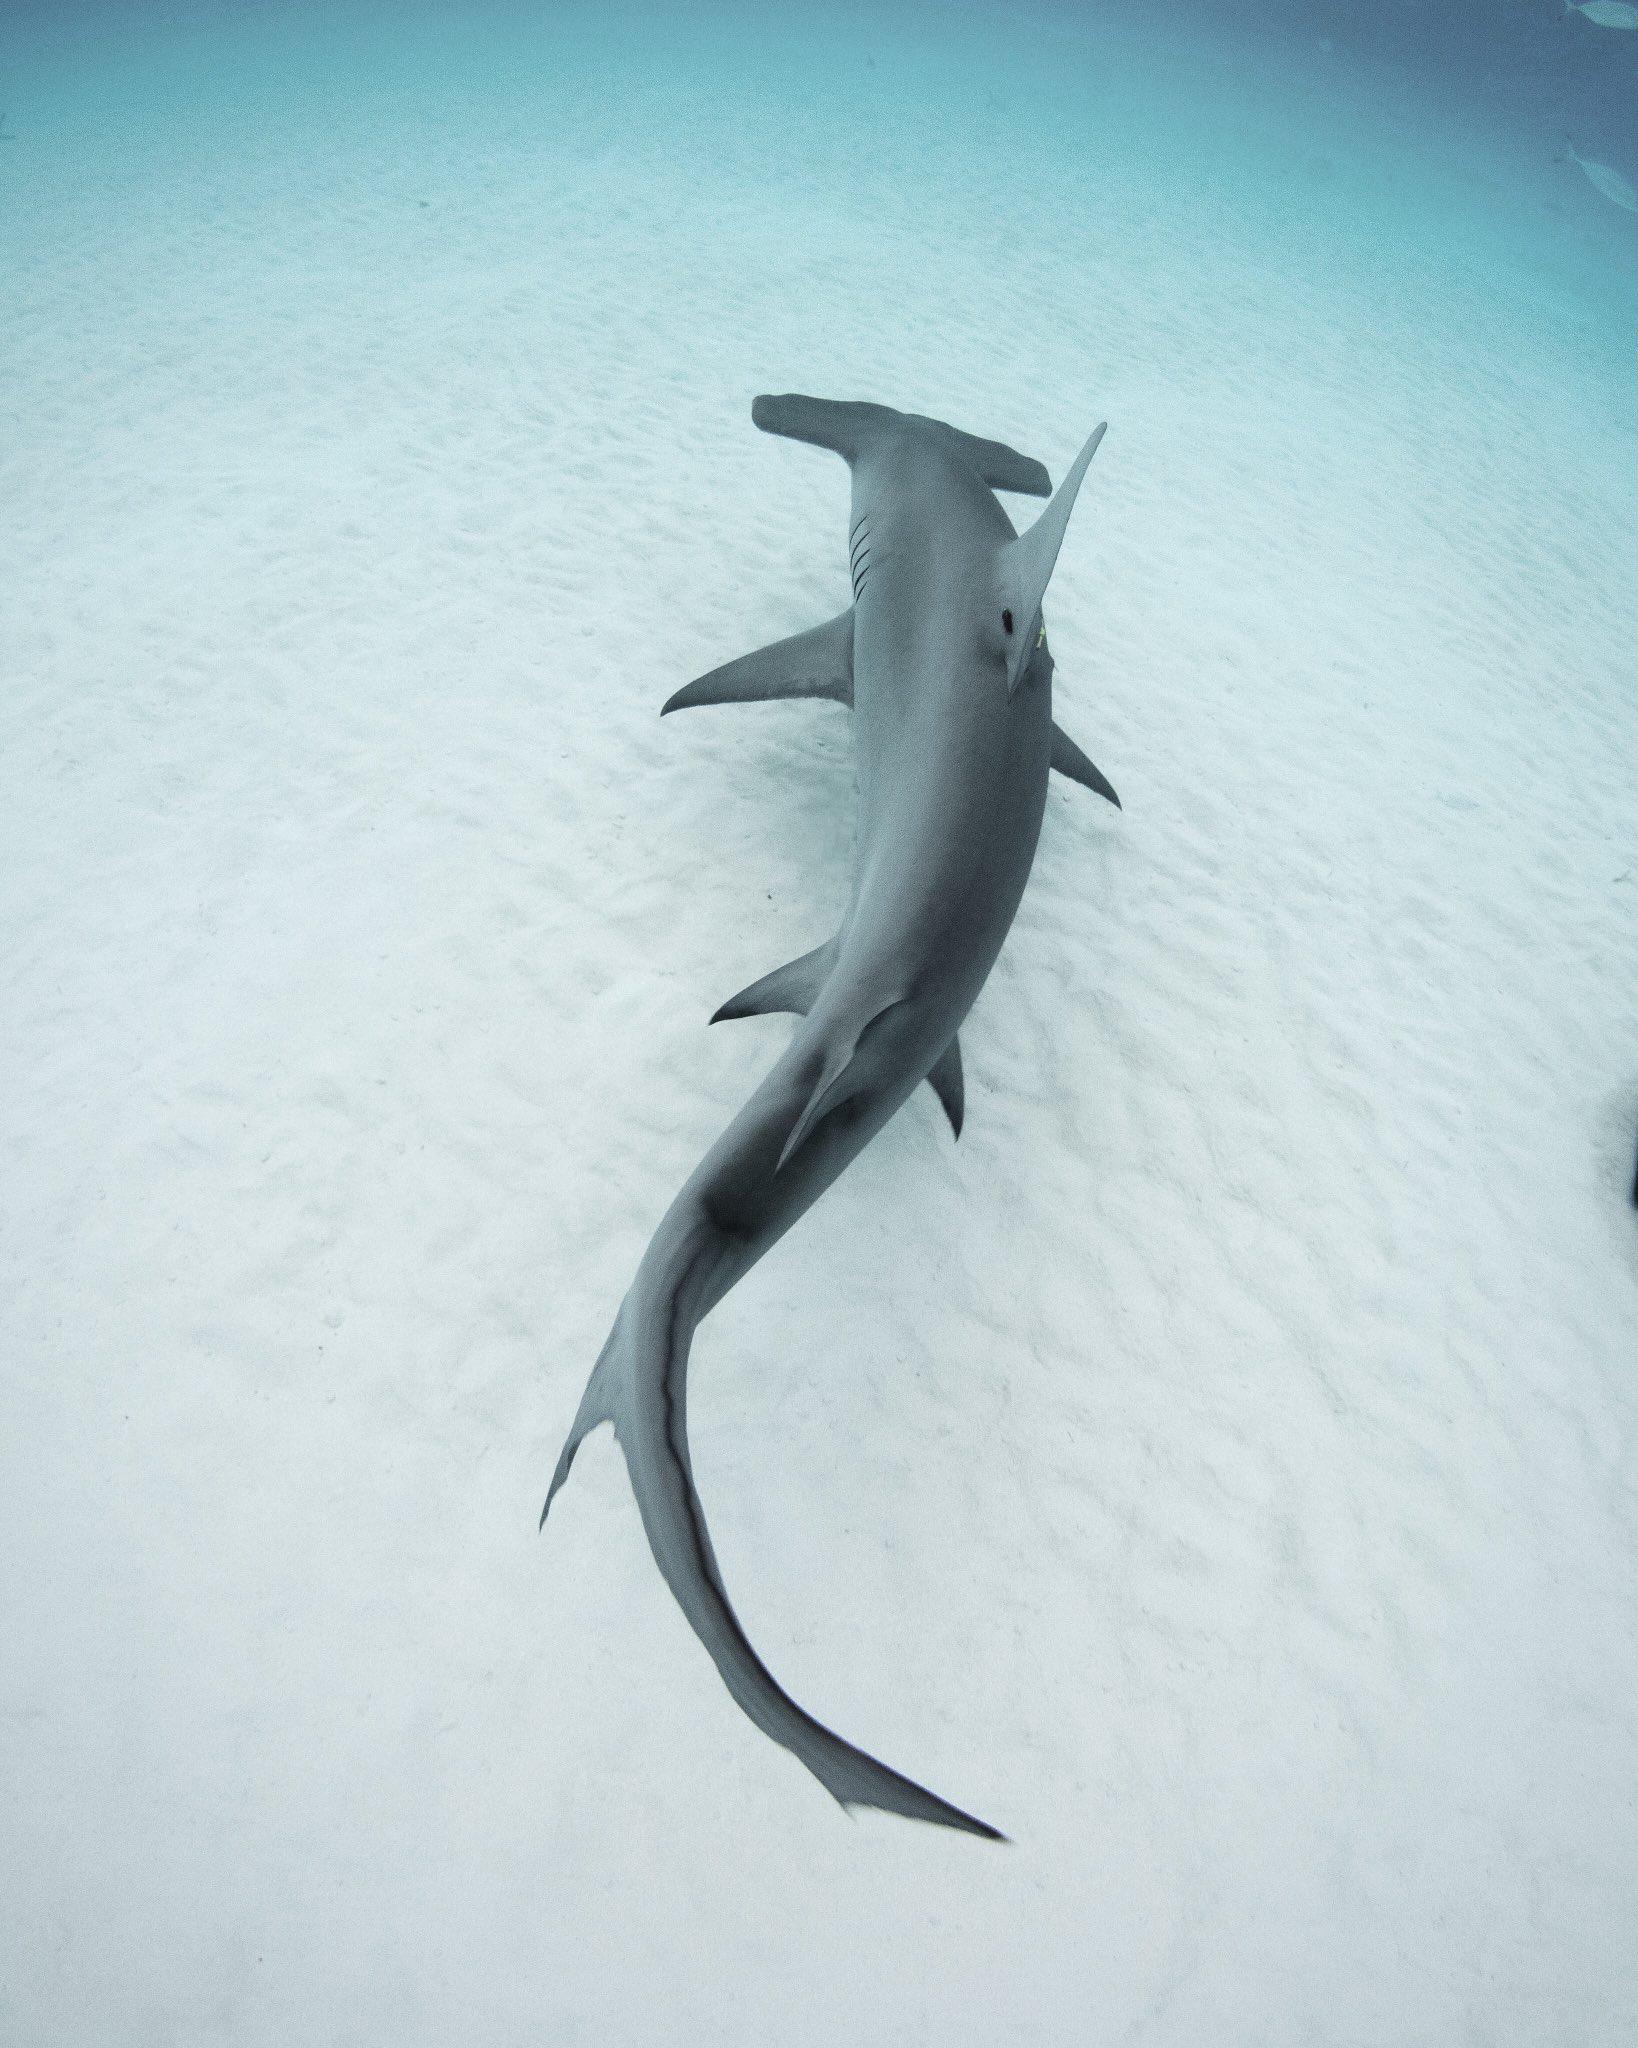 Pin de Ariel O\'Casey en Wildlife | Pinterest | Tiburones, Tiburón ...